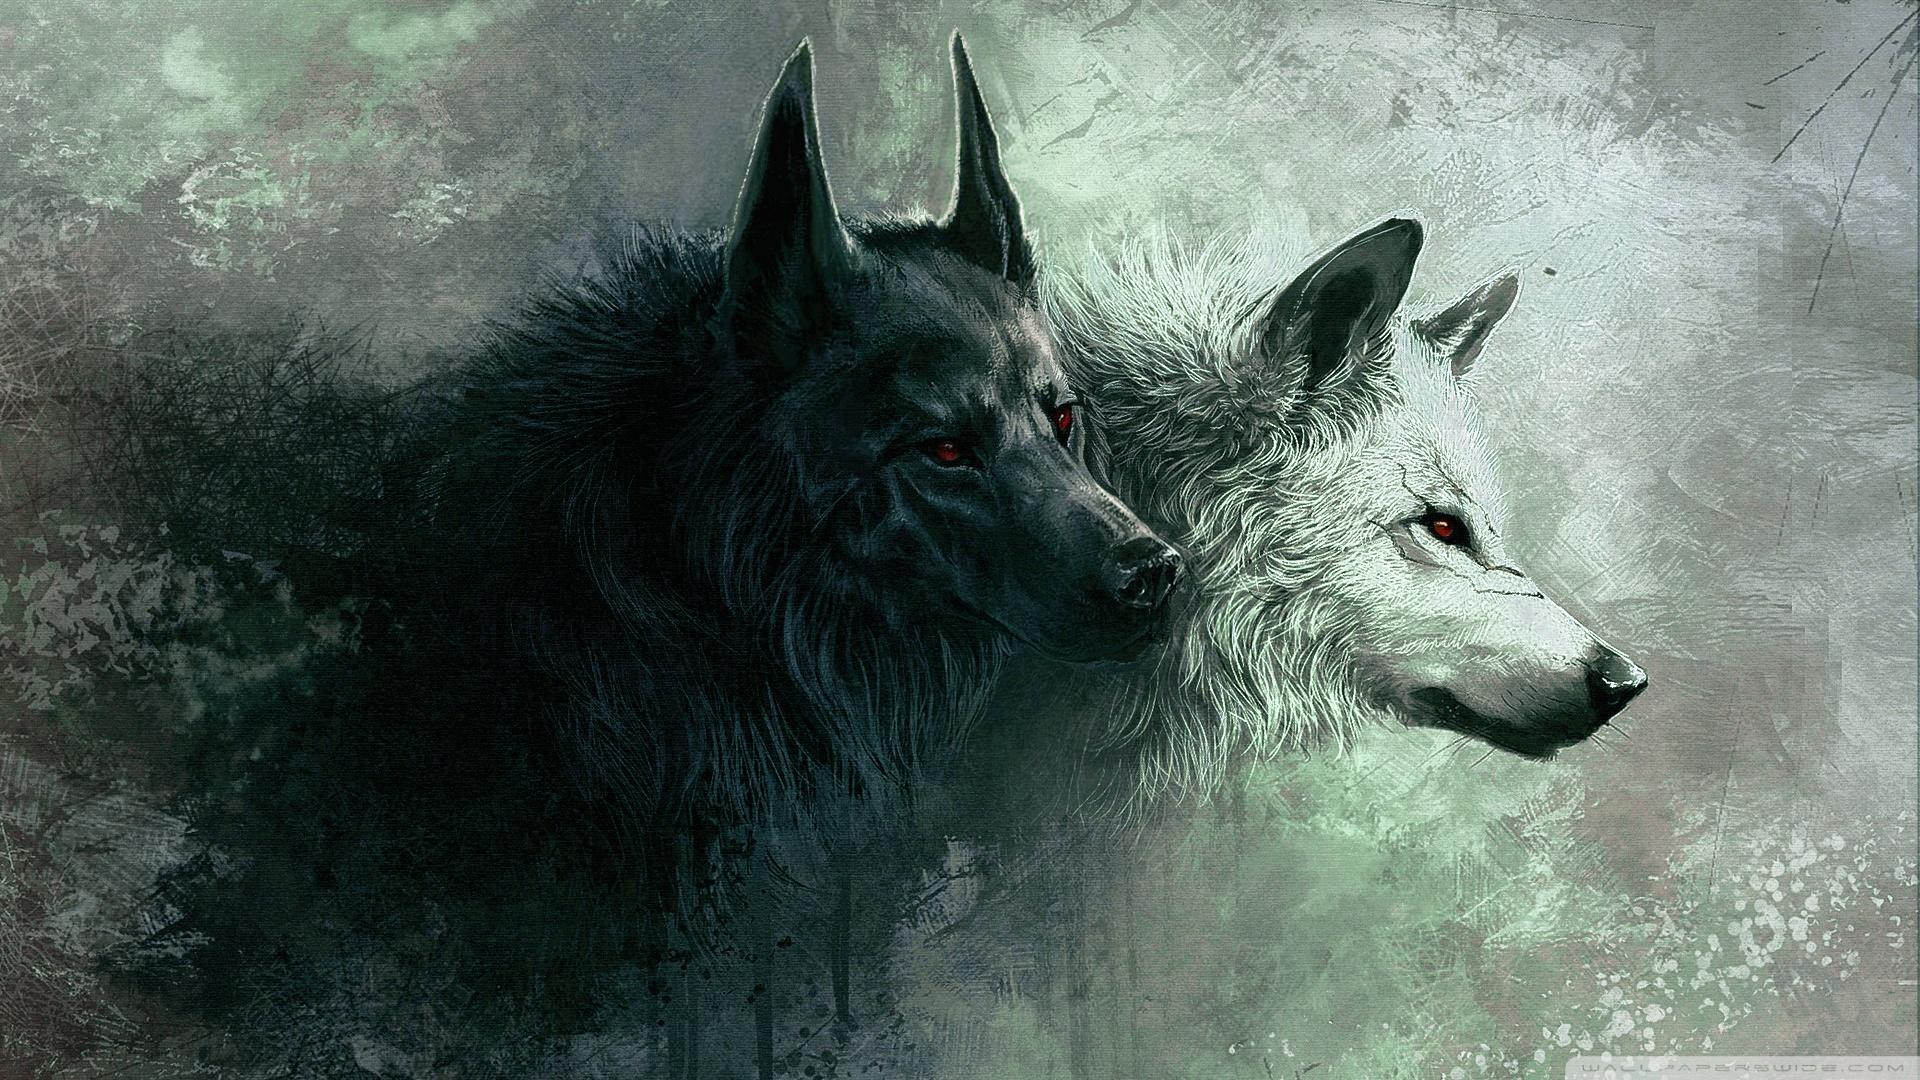 Wolf Hd Wallpaper Background Image 1920x1080 Id 506760